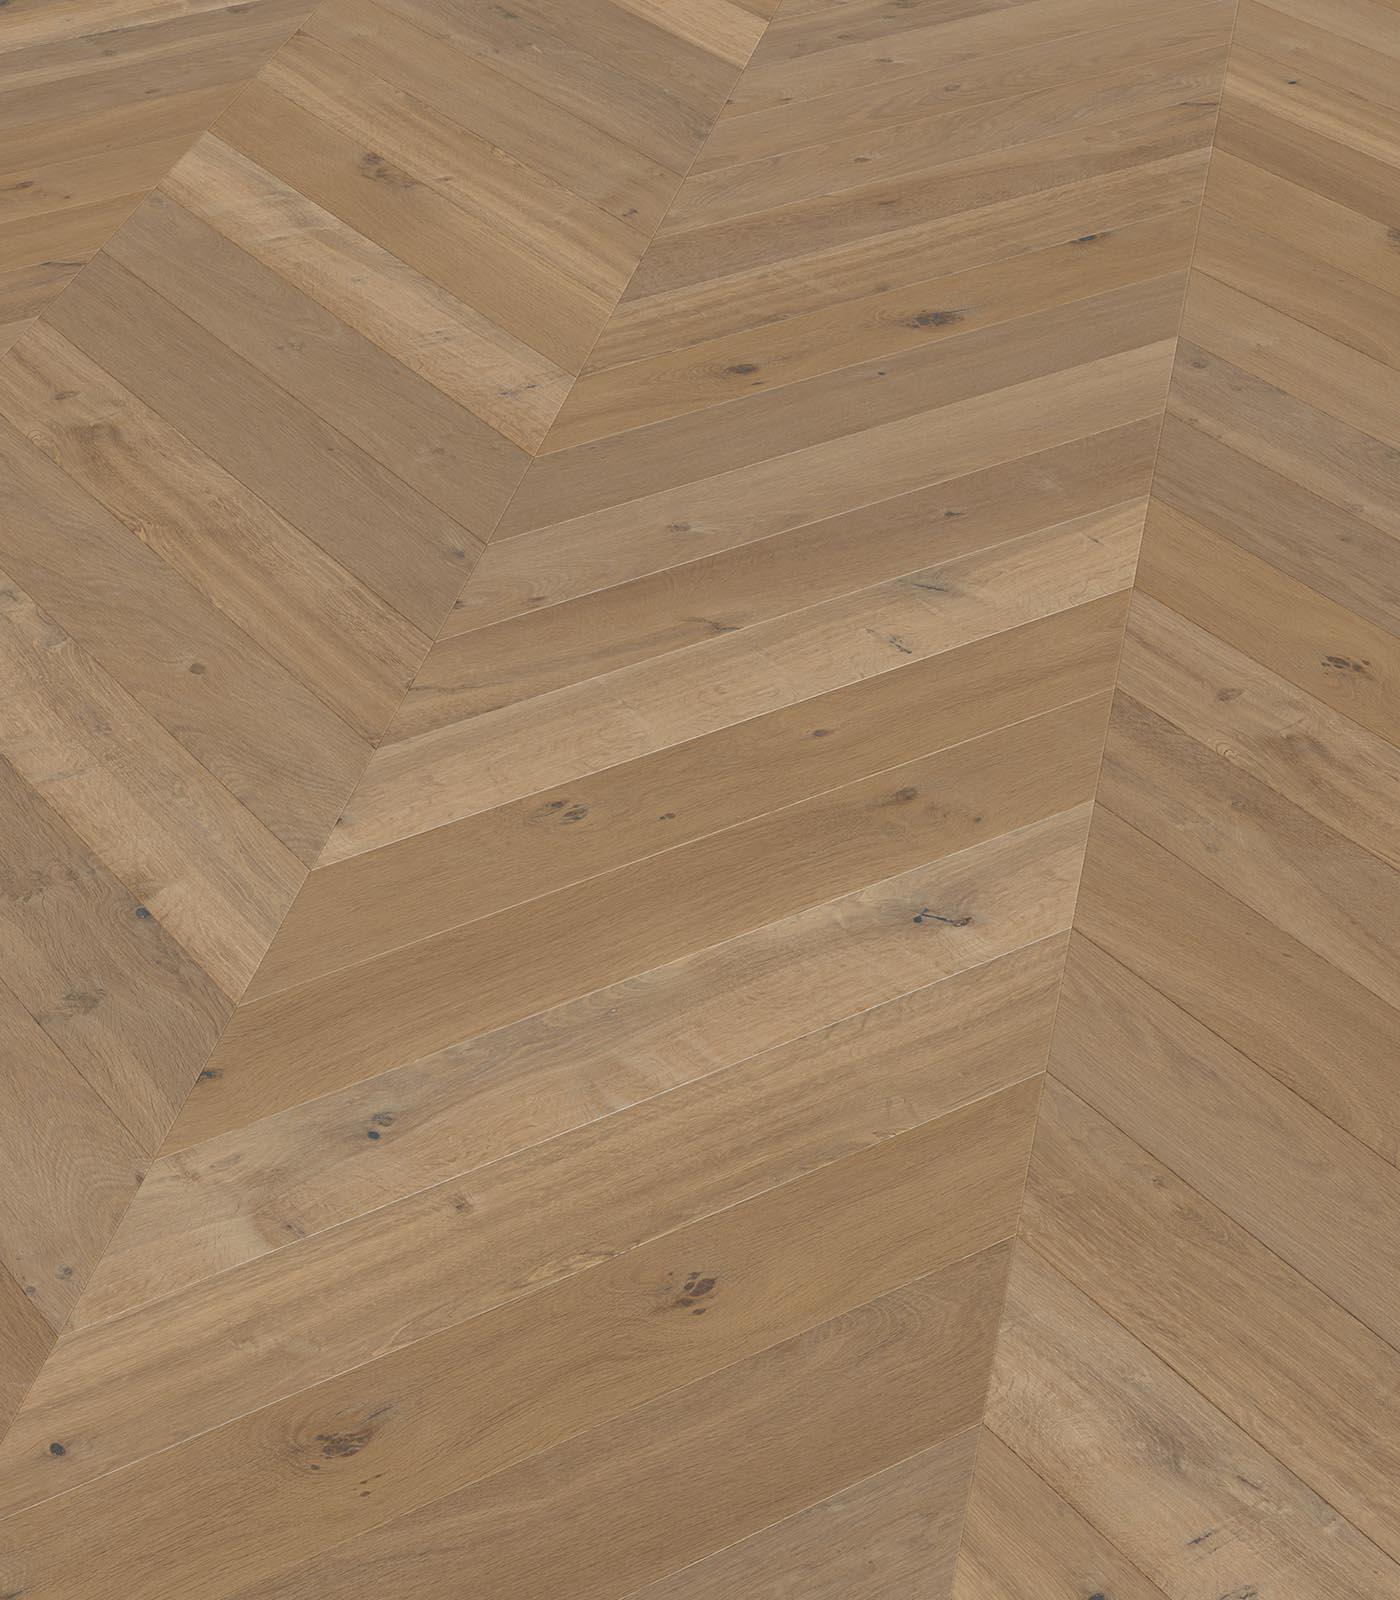 St Moritz-European Oak Flooring-Lifestyle Collection-angle